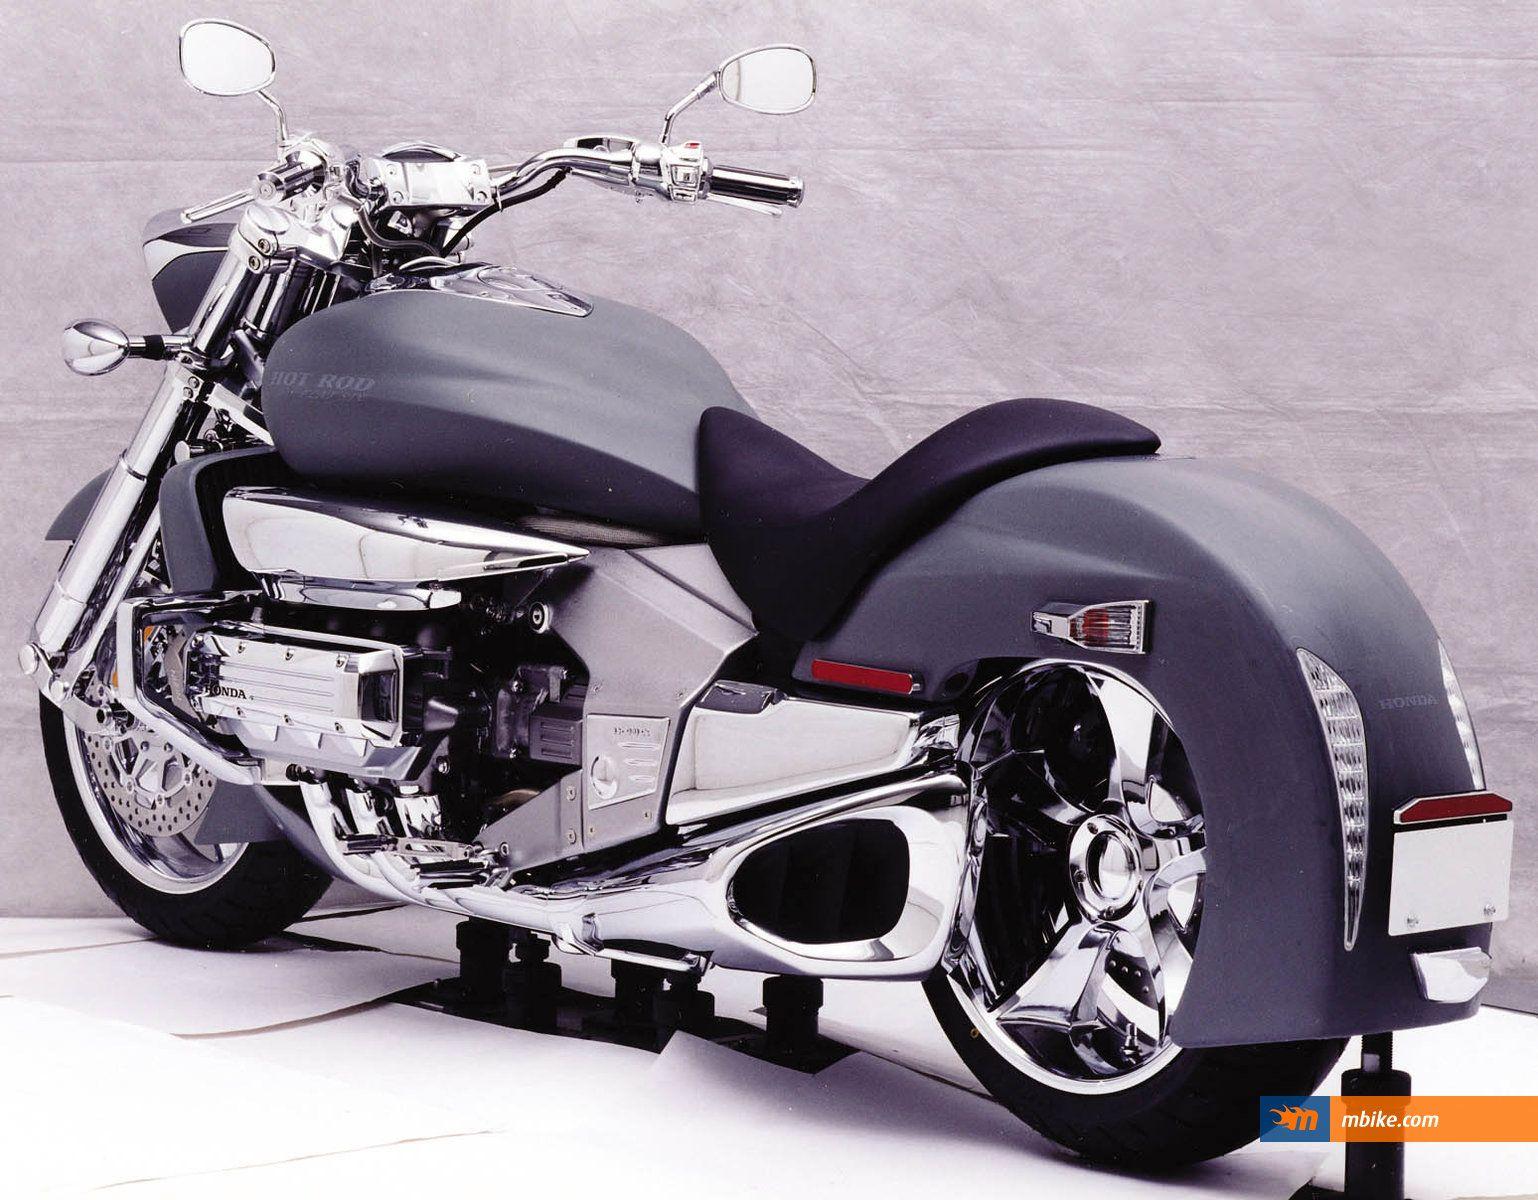 honda valkyrie | 2004 Honda Valkyrie Rune Wallpaper - Mbike.com ...